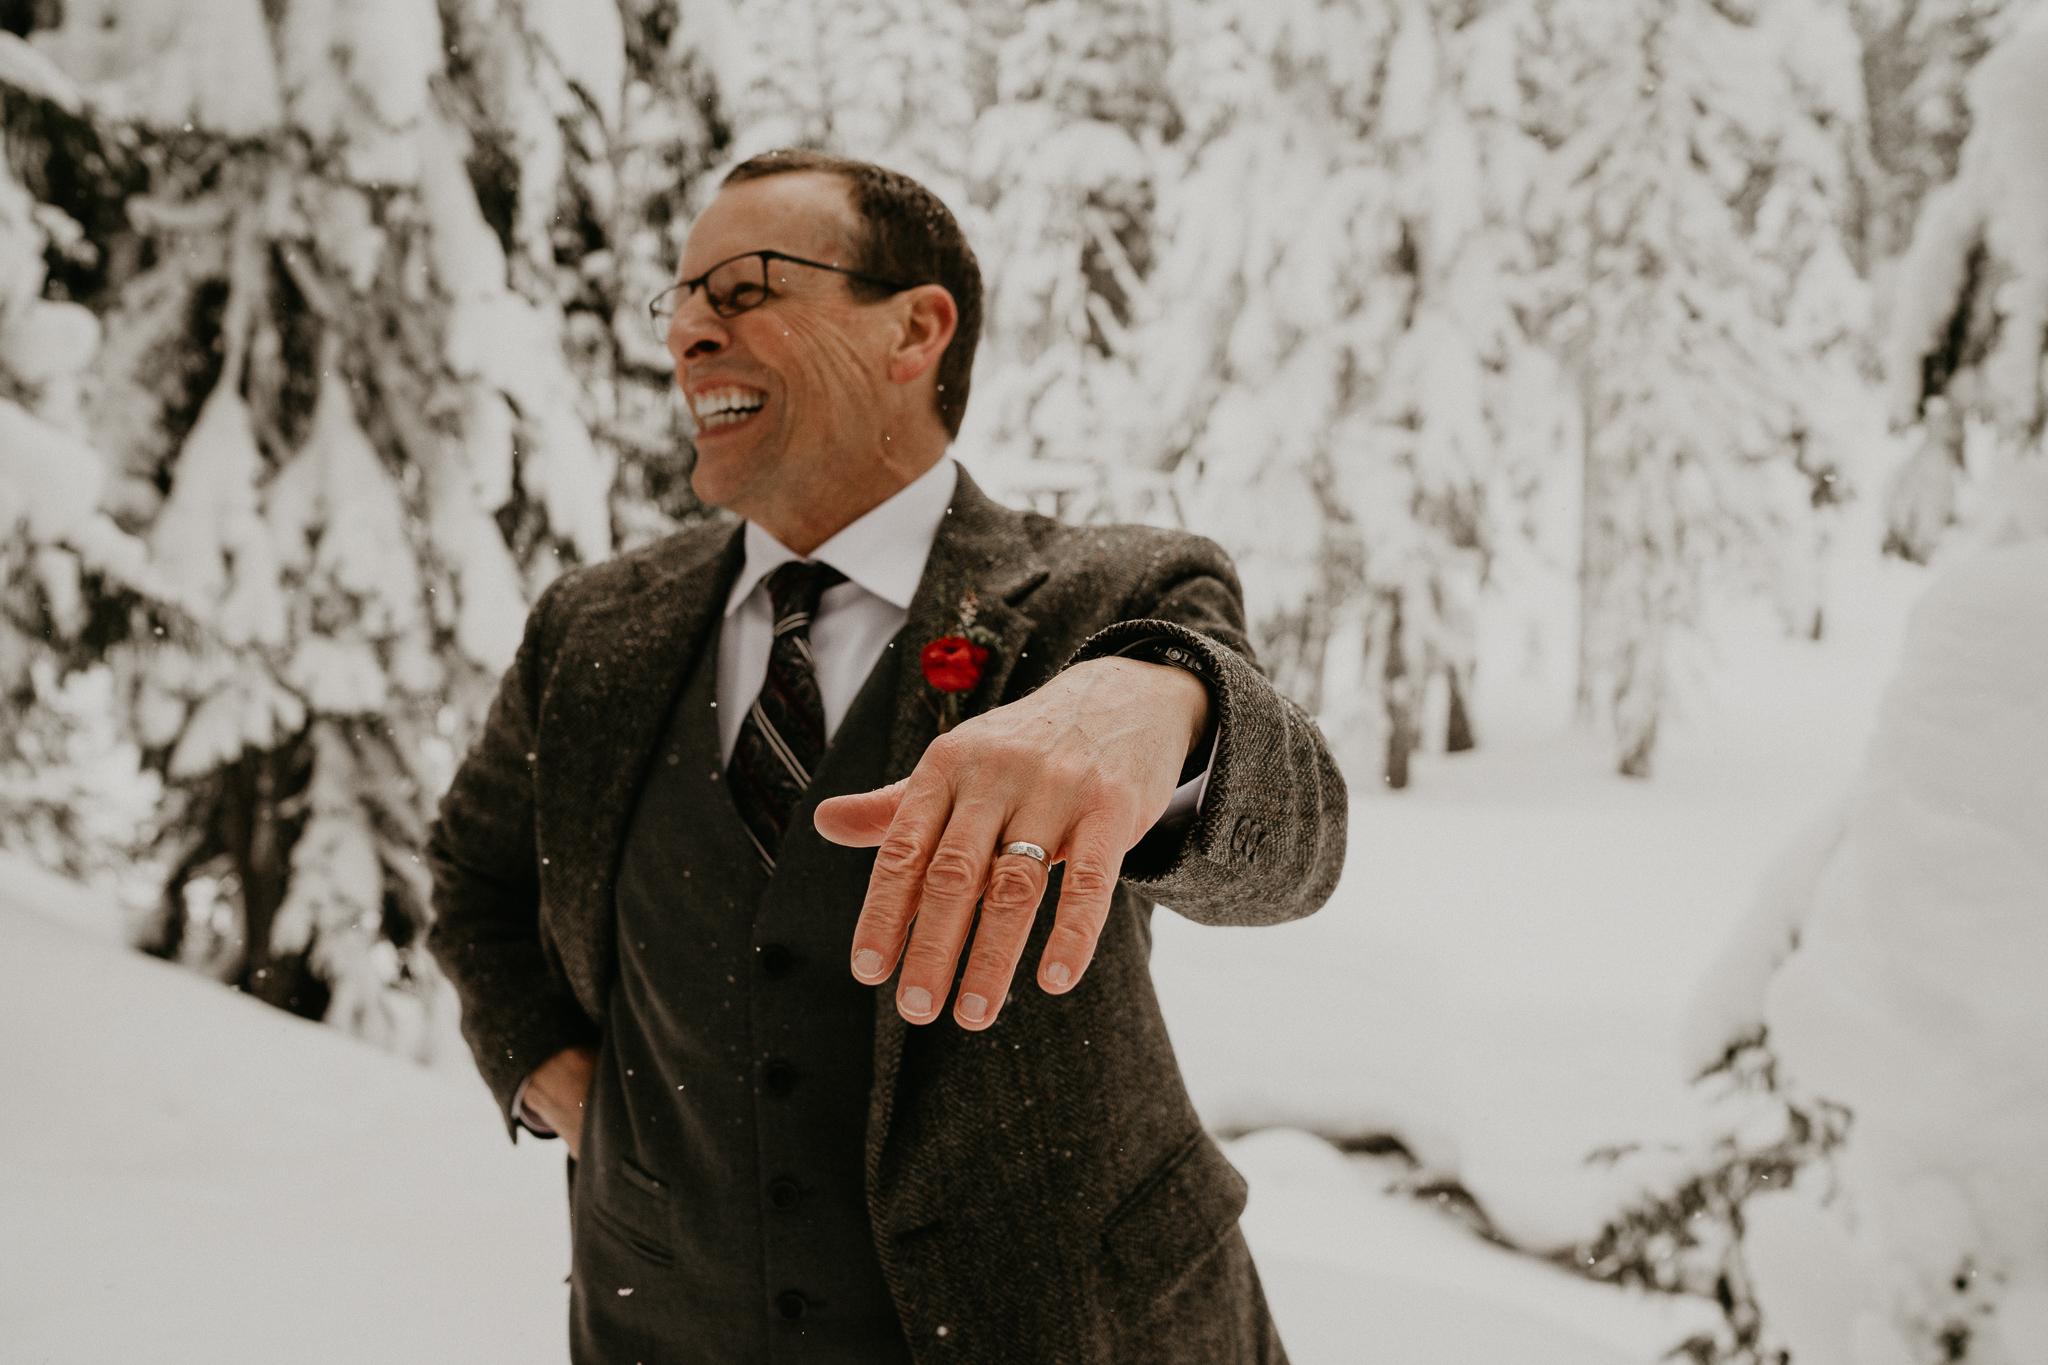 Mount-Rainier-Snow-Winter-Elopement-Adventure-Photographer2-65.jpg